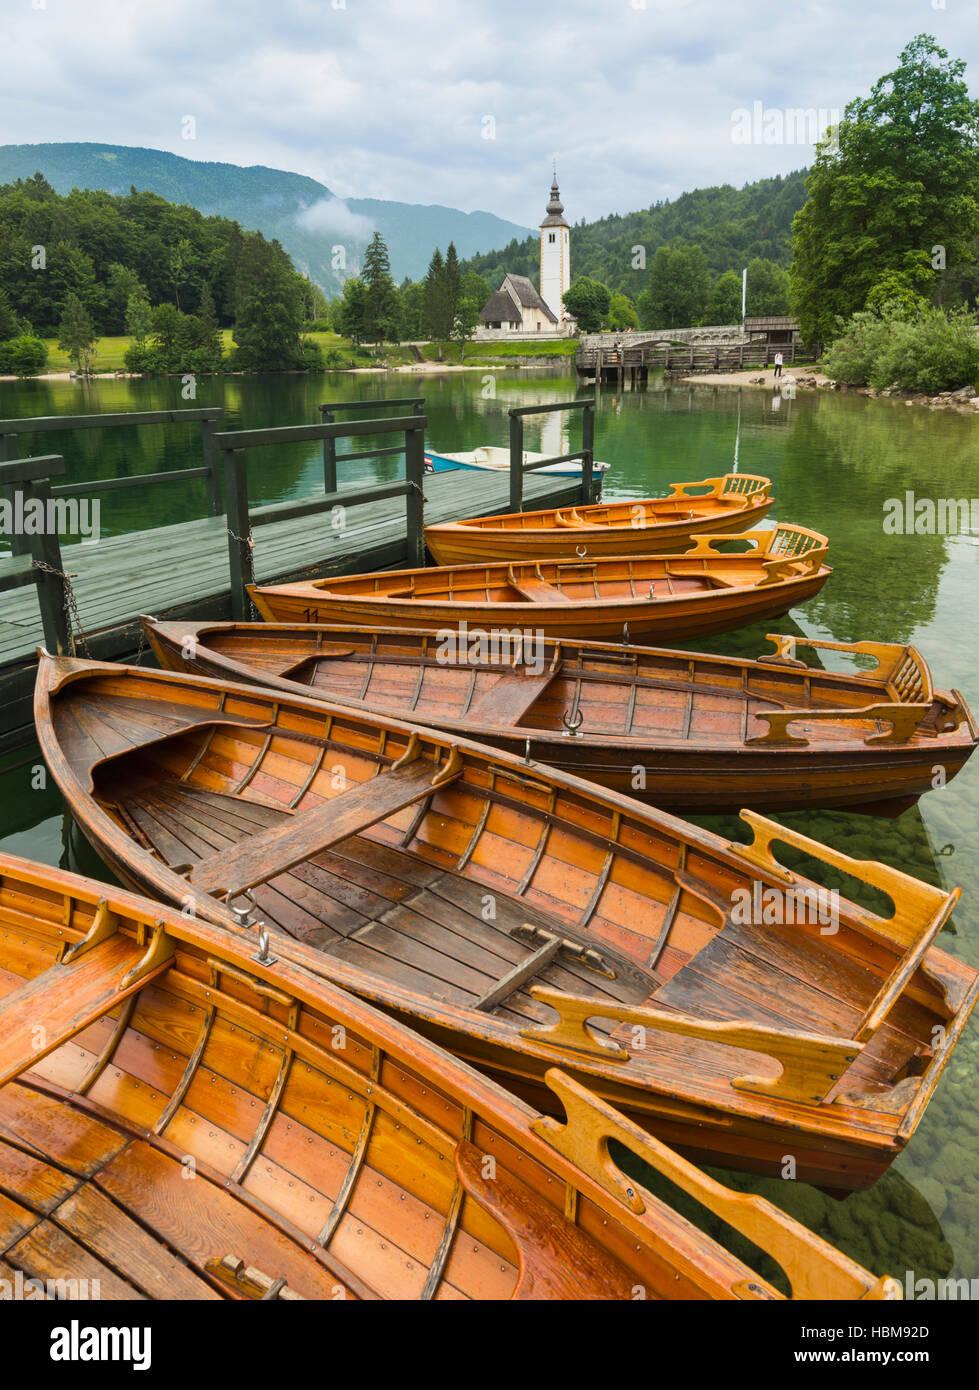 Lake Bohinj (Bohinjsko jezero), Triglav National Park, Upper Carniola, Slovenia. Rowing boats for rent. The church - Stock Image